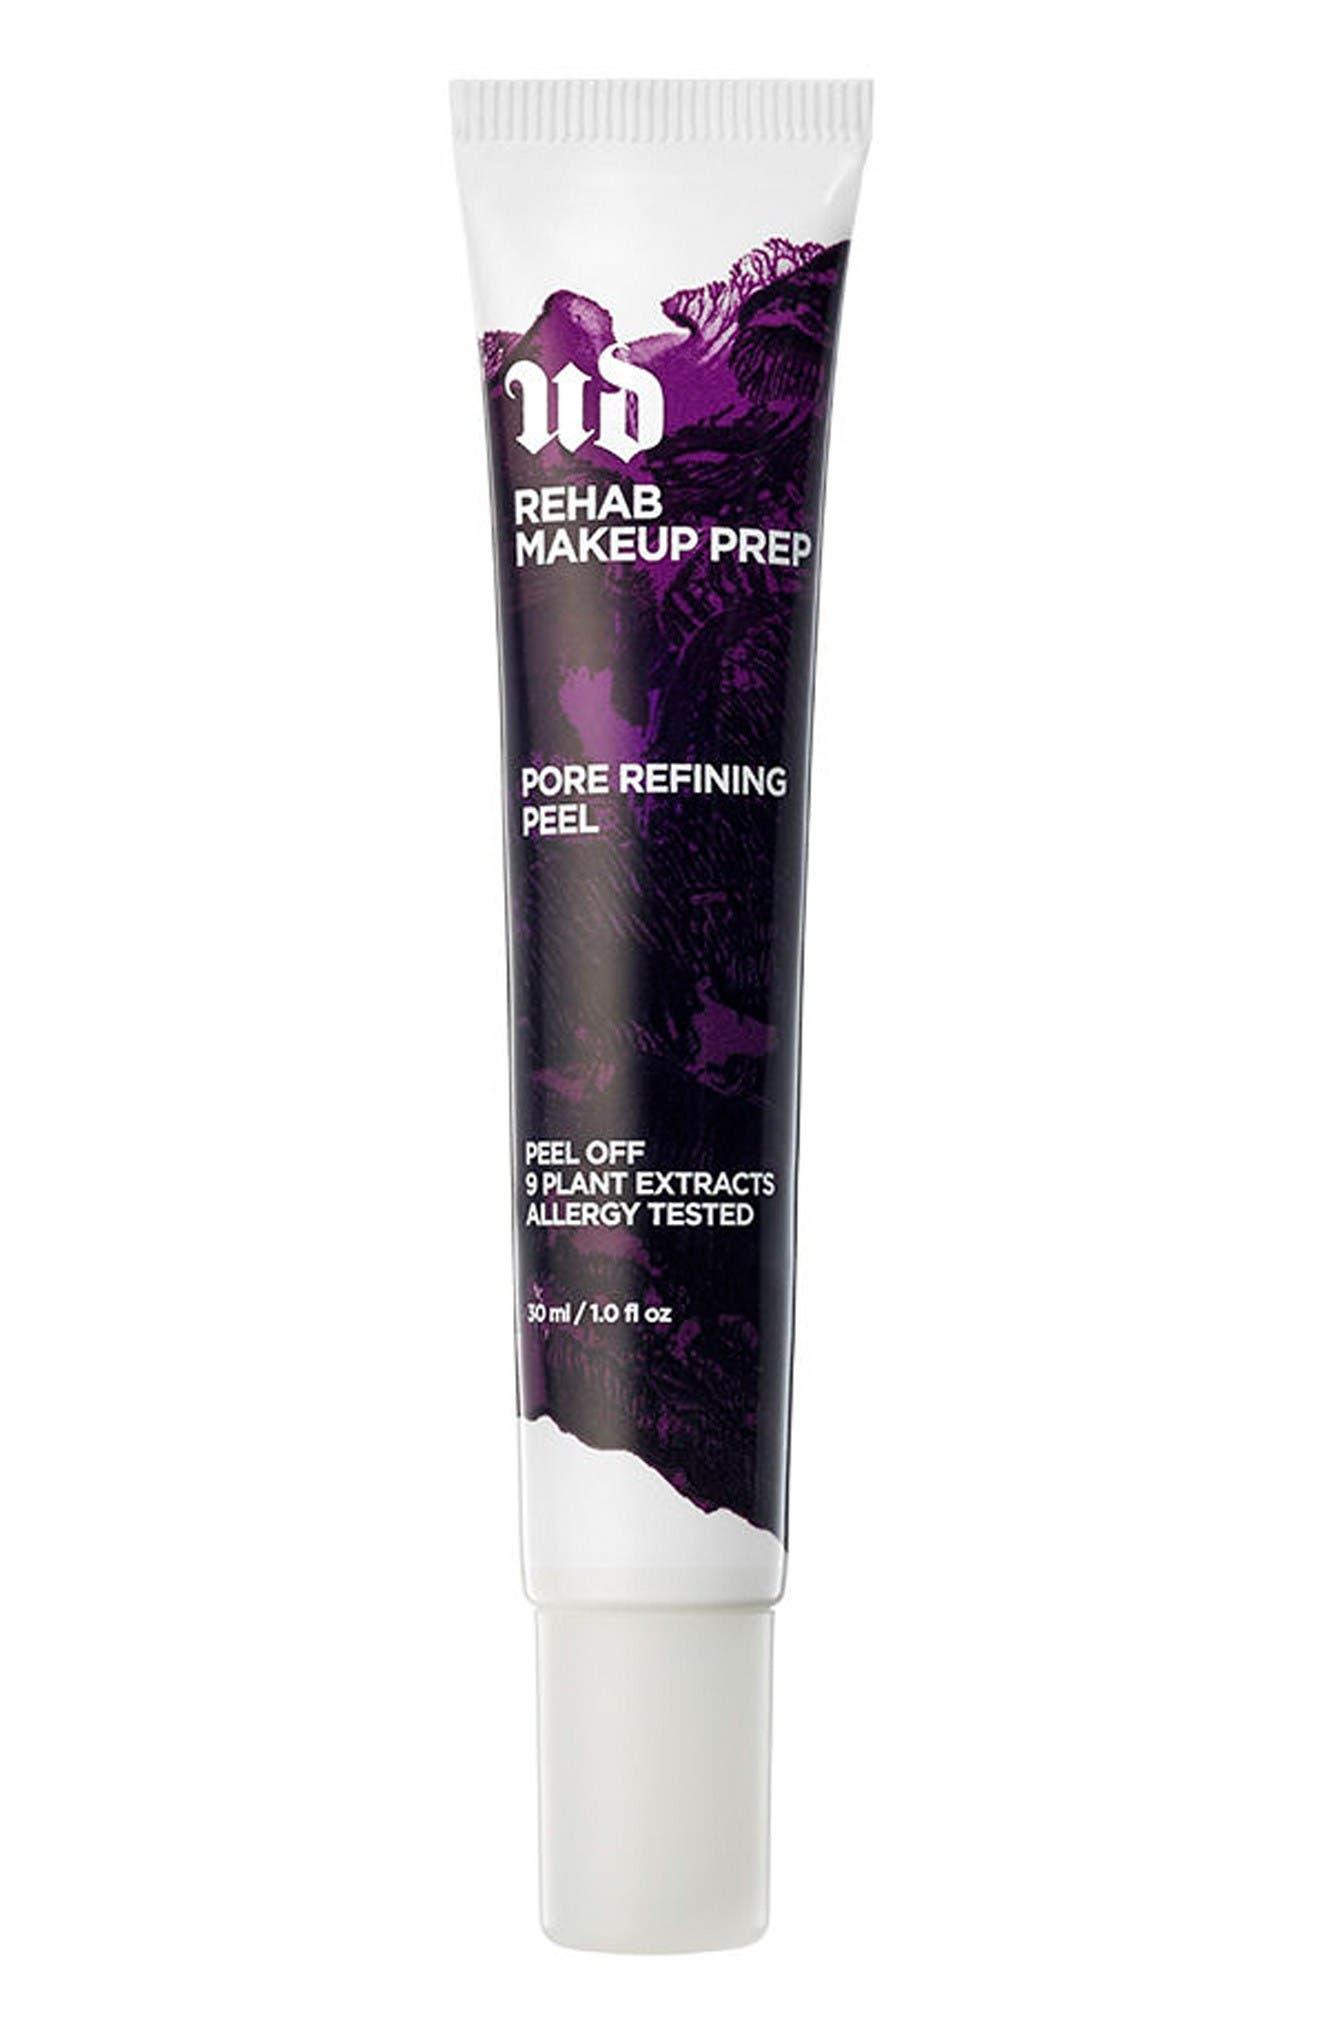 Urban Decay Rehab Makeup Prep Pore Refining Peel